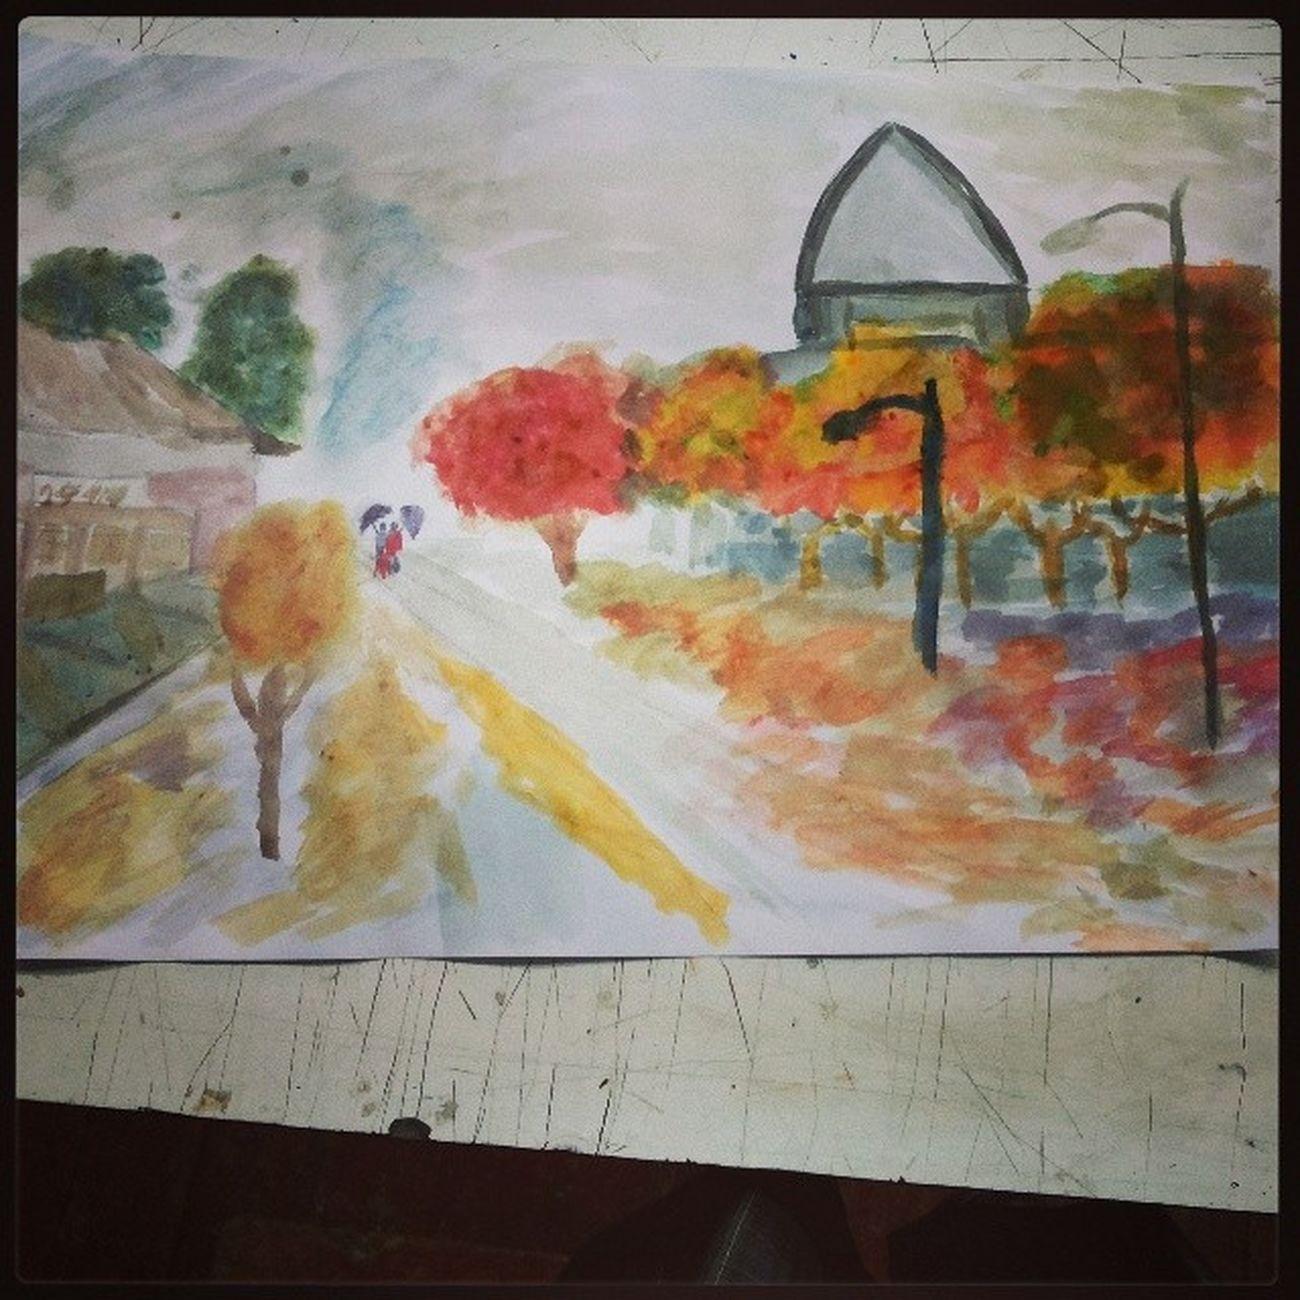 Me creo artista ajja Artes Dibujo Listo Ojala tenga70♥♥